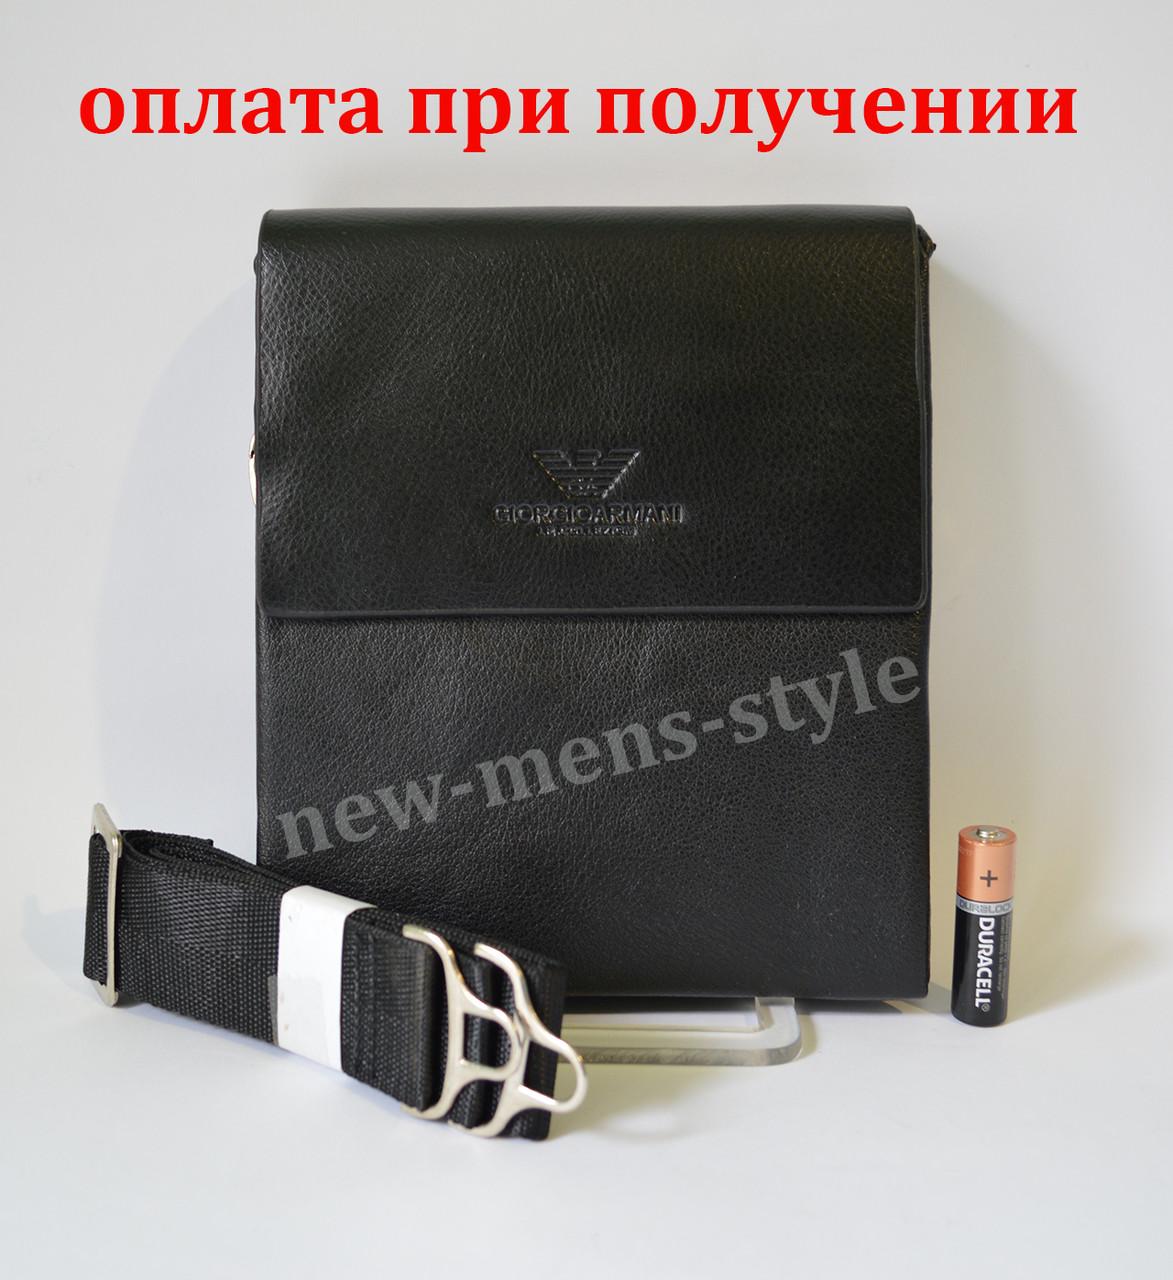 1095d5716e82 Мужская кожаная фирменная сумка барсетка Giorgio Armani Polo купить